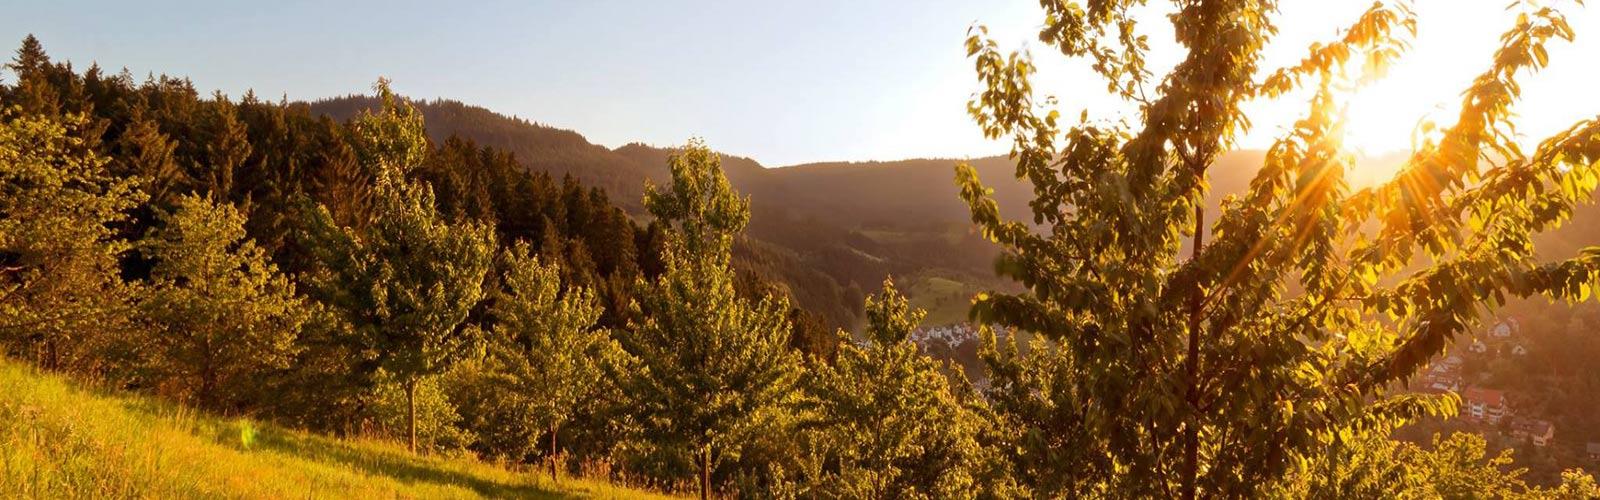 panoramaweg_adlerbad_petra